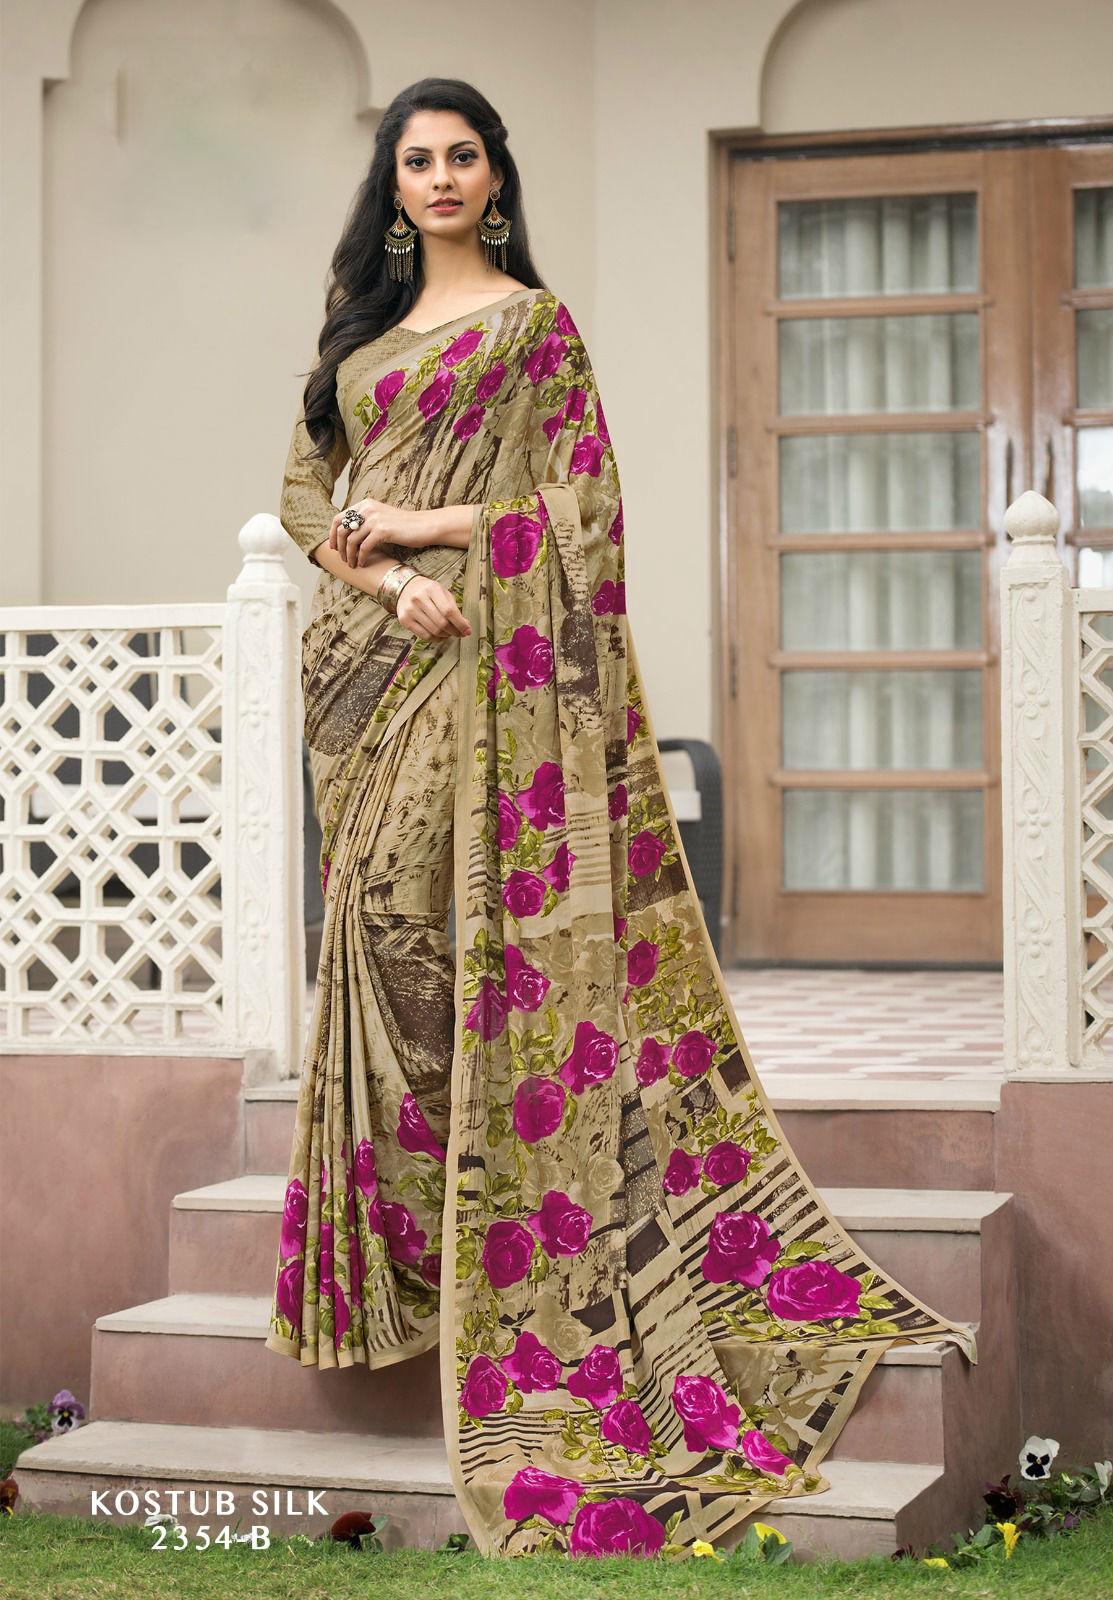 Best online saree shopping sites